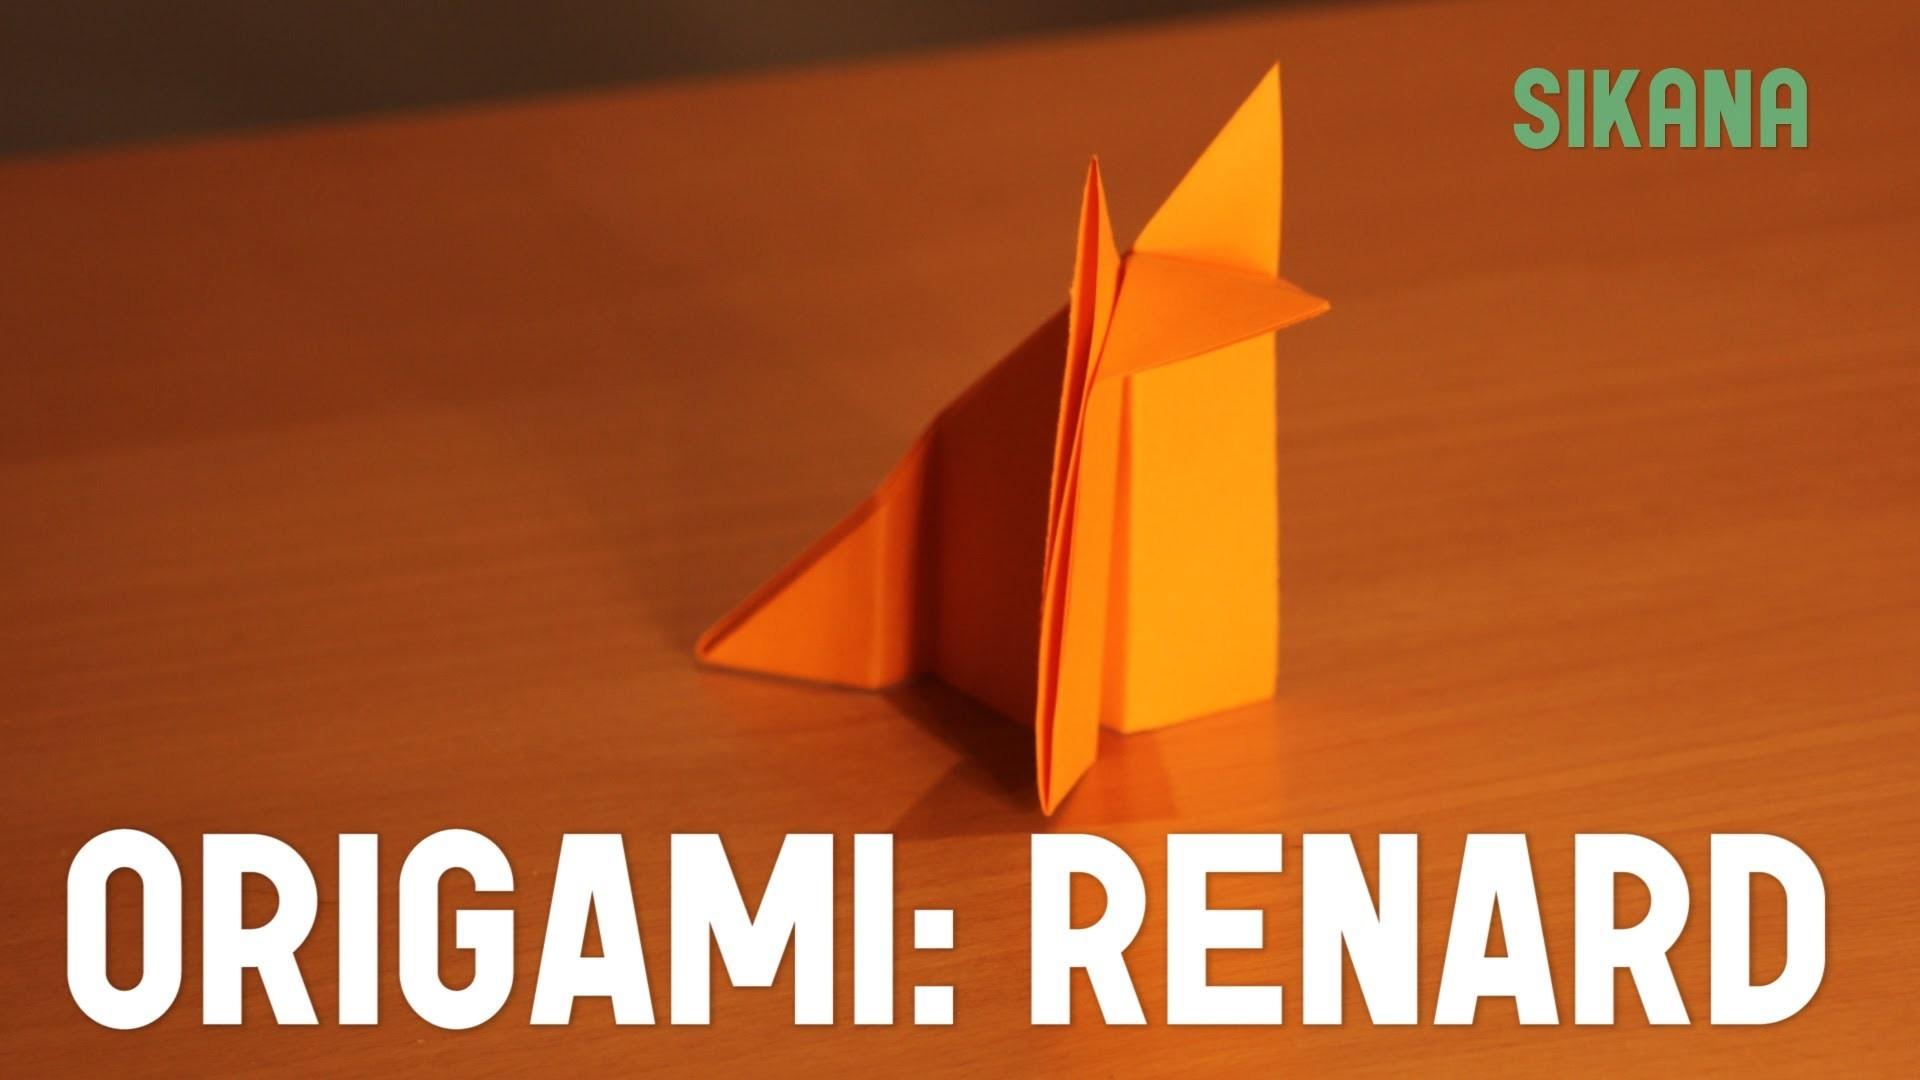 origami renard en papier facile hd. Black Bedroom Furniture Sets. Home Design Ideas